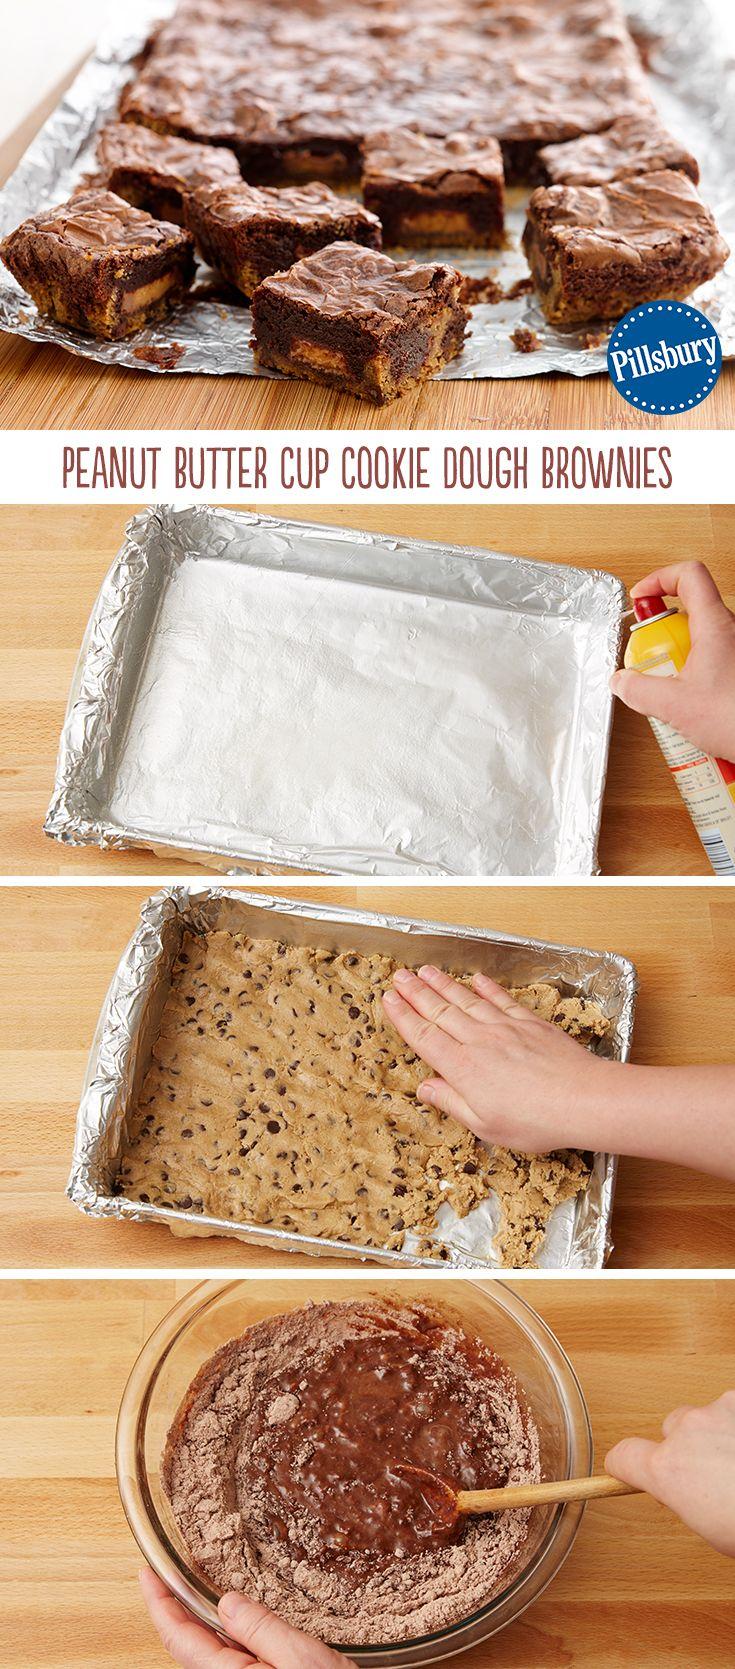 Peanut Butter Cup Cookie Dough Brownies Recipe Peanut Butter